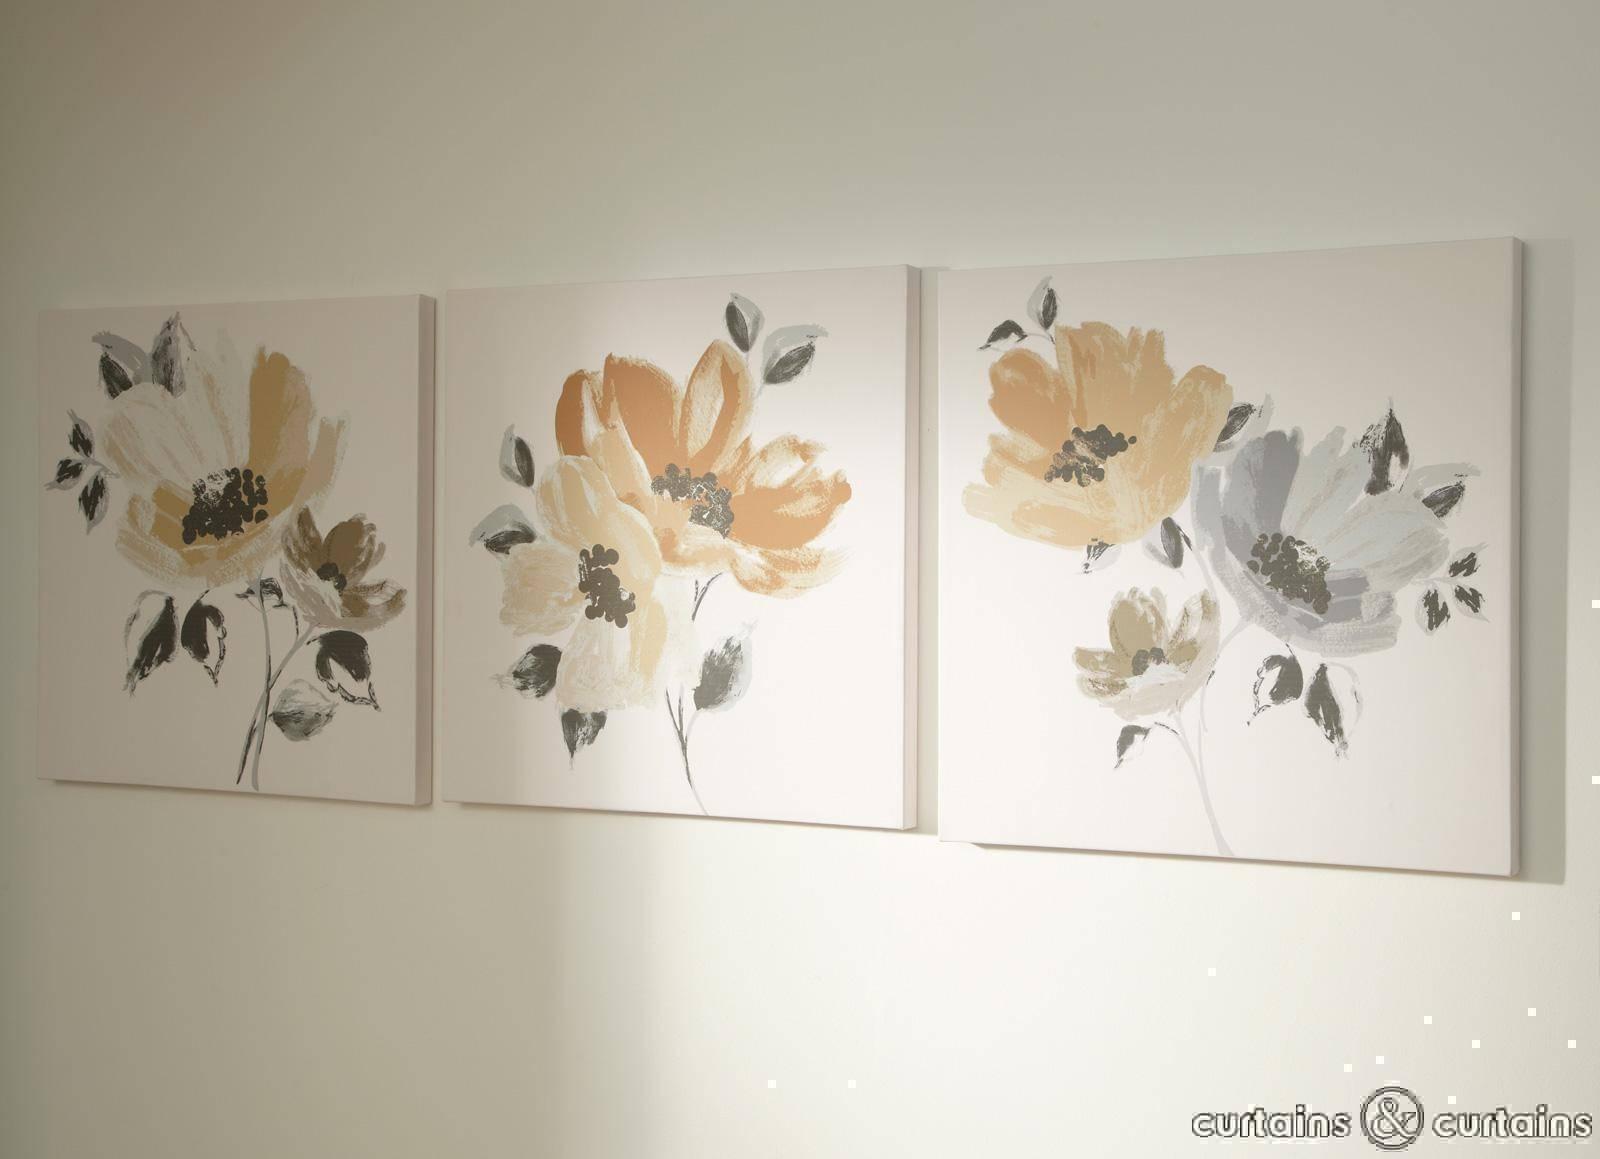 Canvas Flower Wall Art Regarding Most Recent Floral Wall Art Canvas (View 5 of 20)